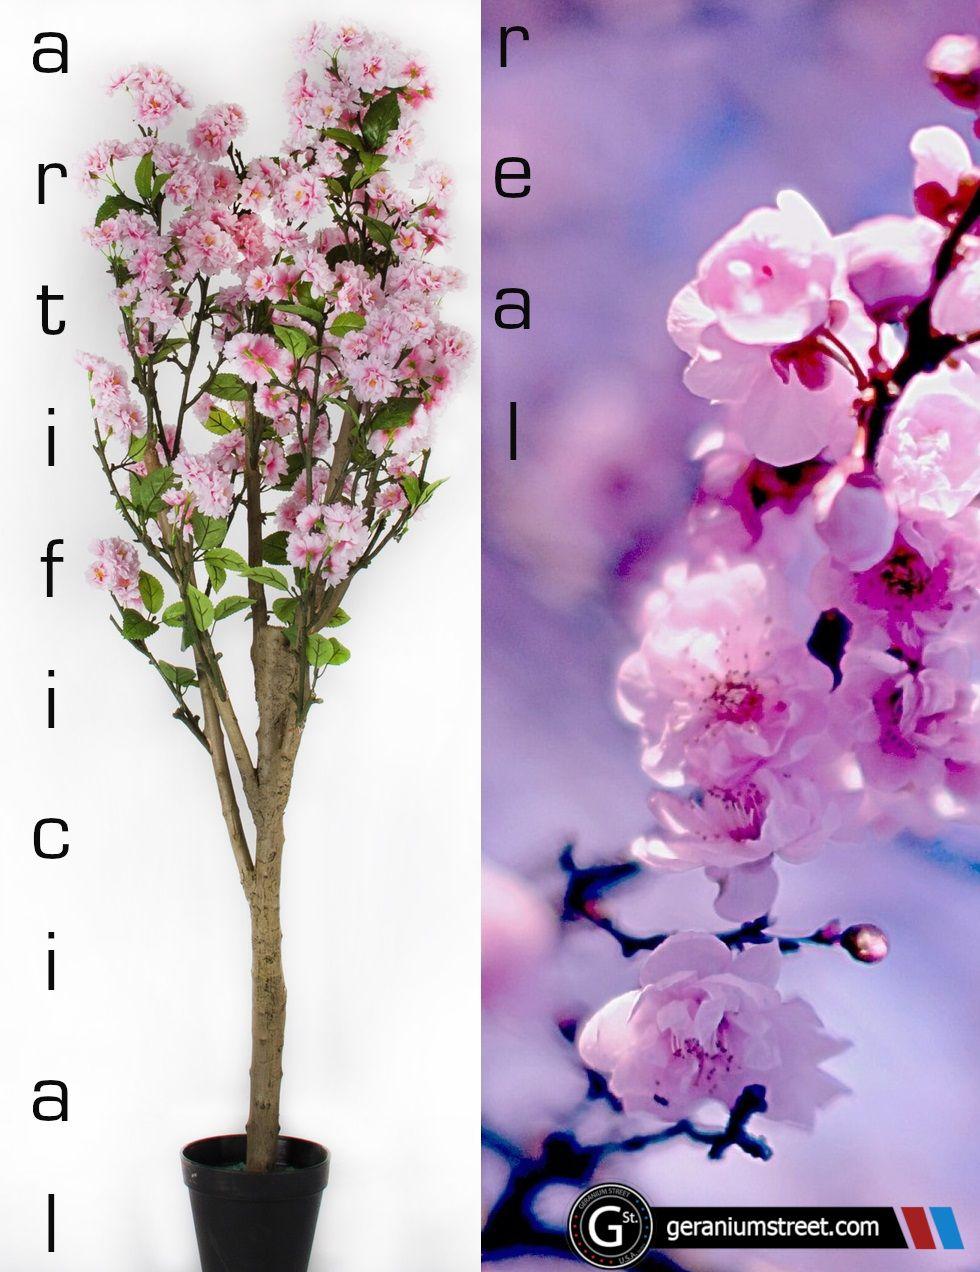 Artificial Cherry Blossom Tree 4 Feet Of Stunning Realistic Beauty Artificial Cherry Blossom Tree Artificial Boxwood Cherry Blossom Tree